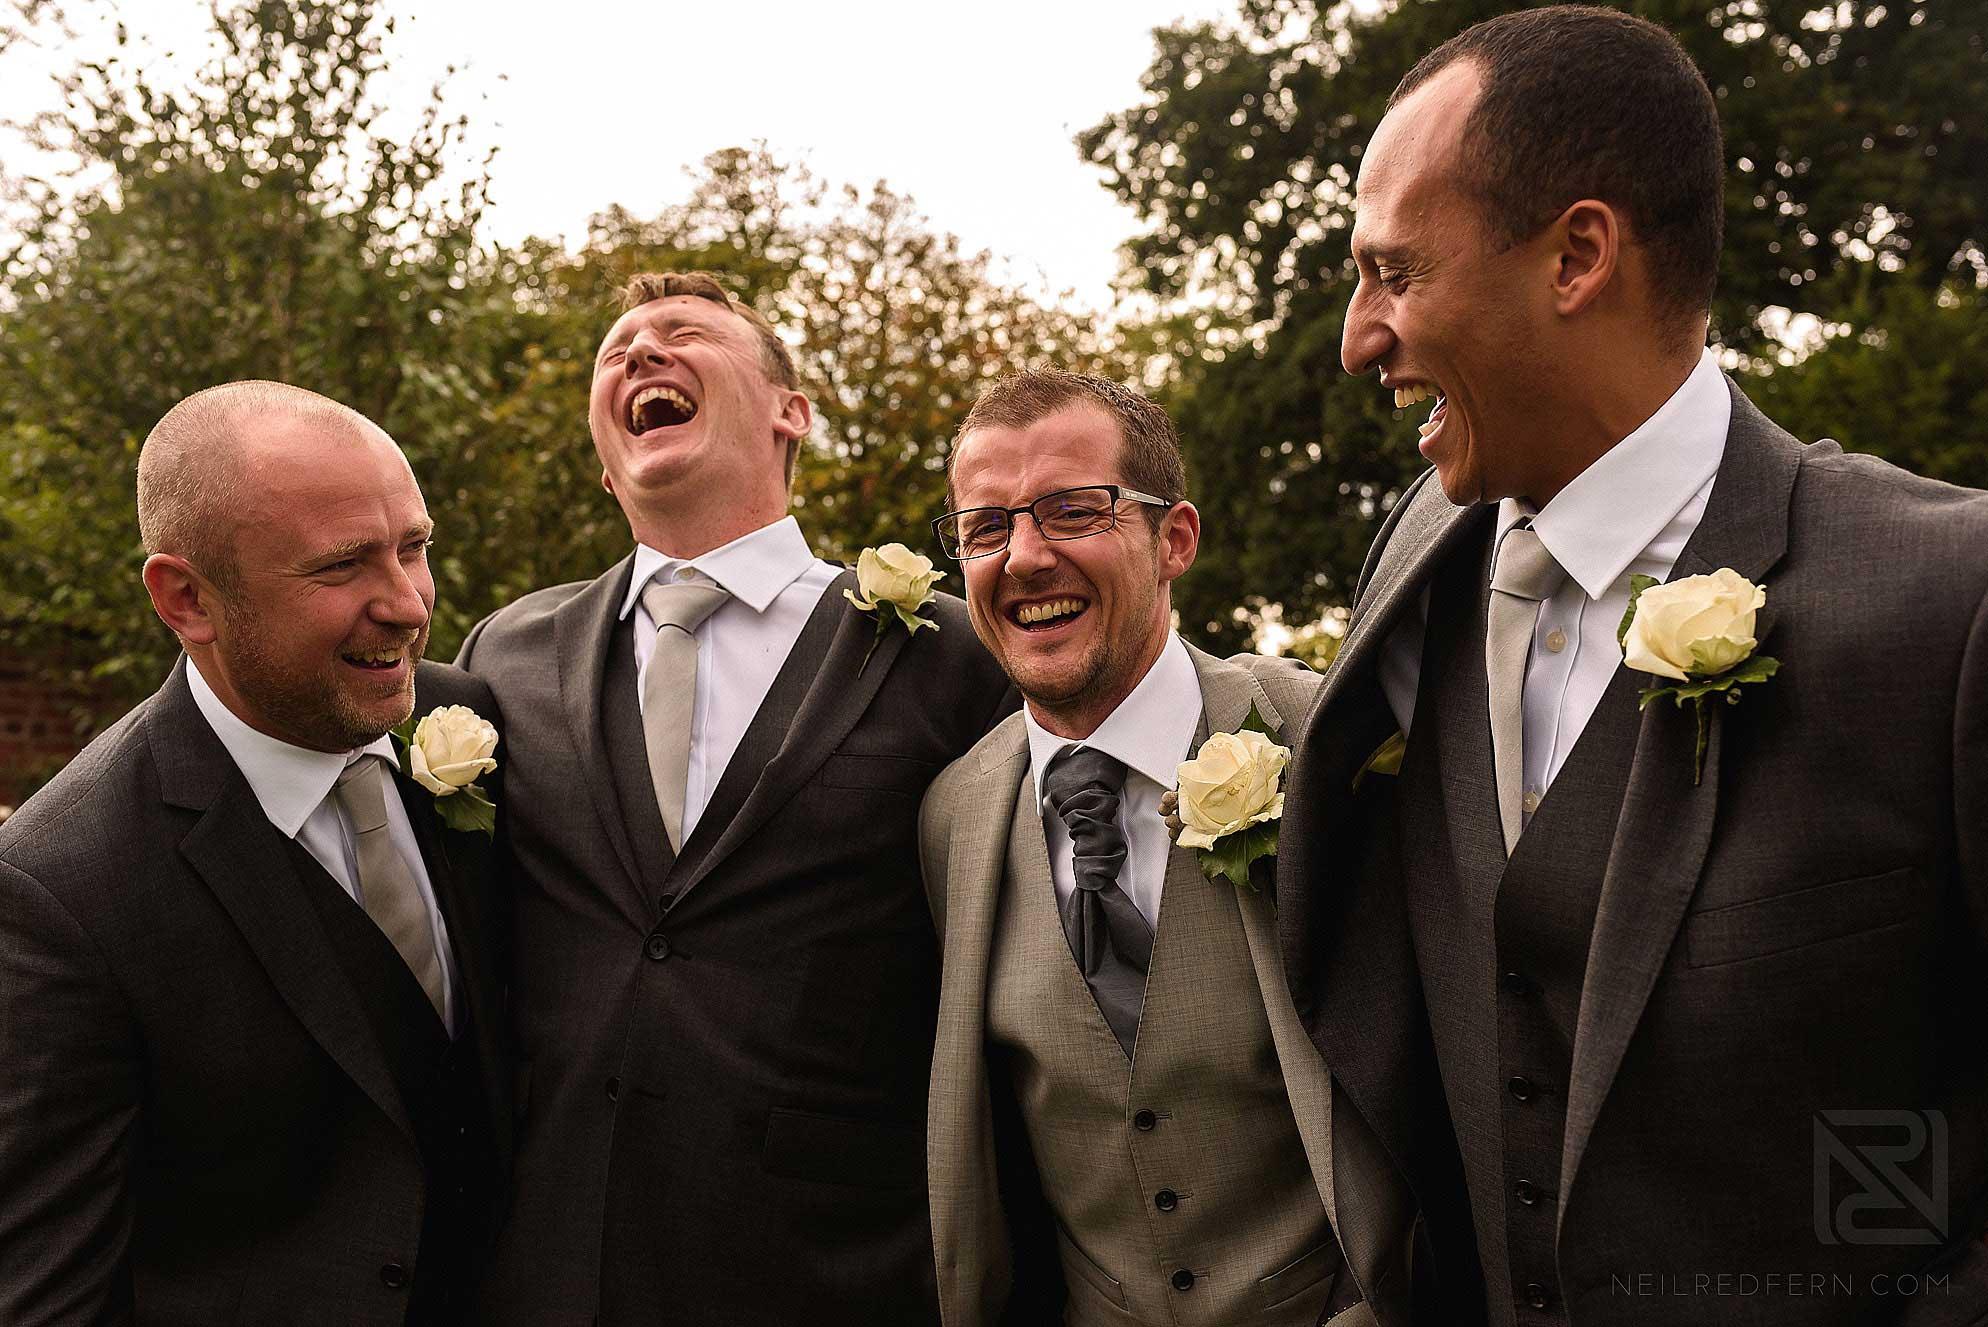 happy groomsmen at wedding